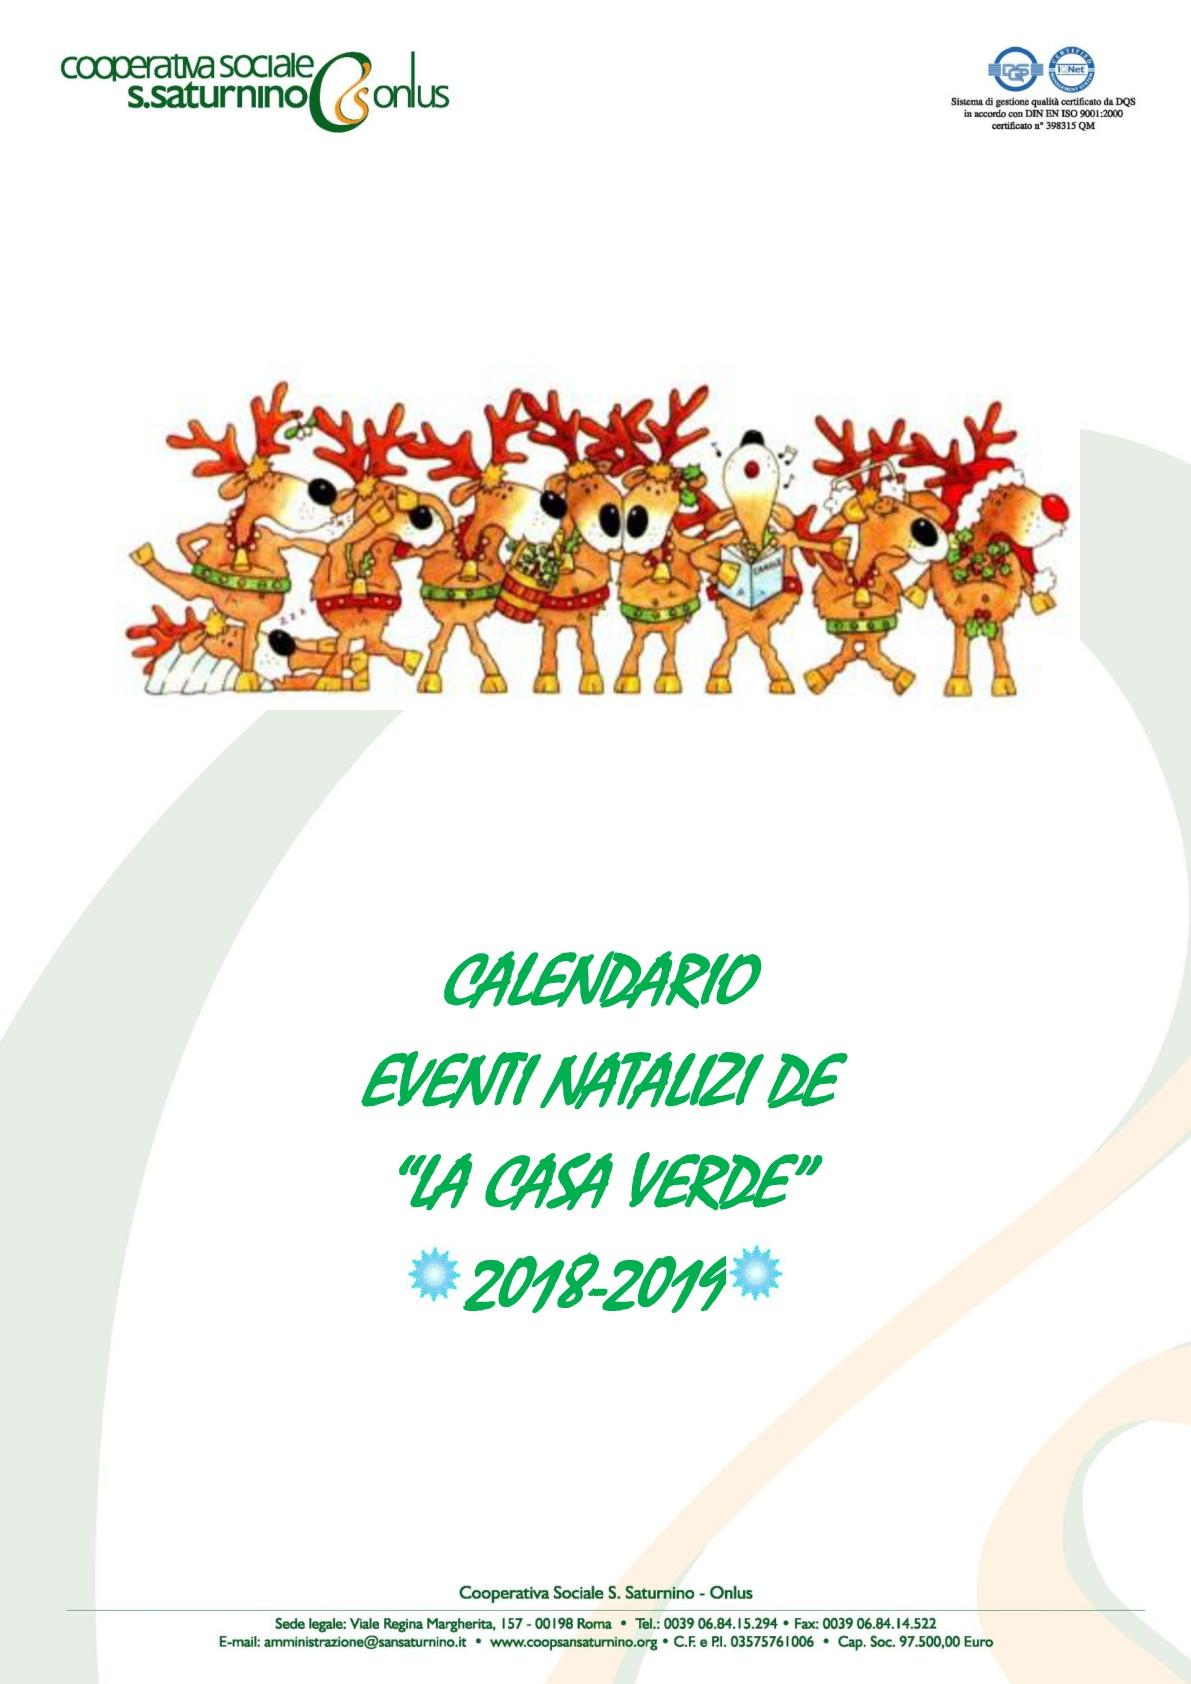 Calendario eventi Natalizi a Casa Verde